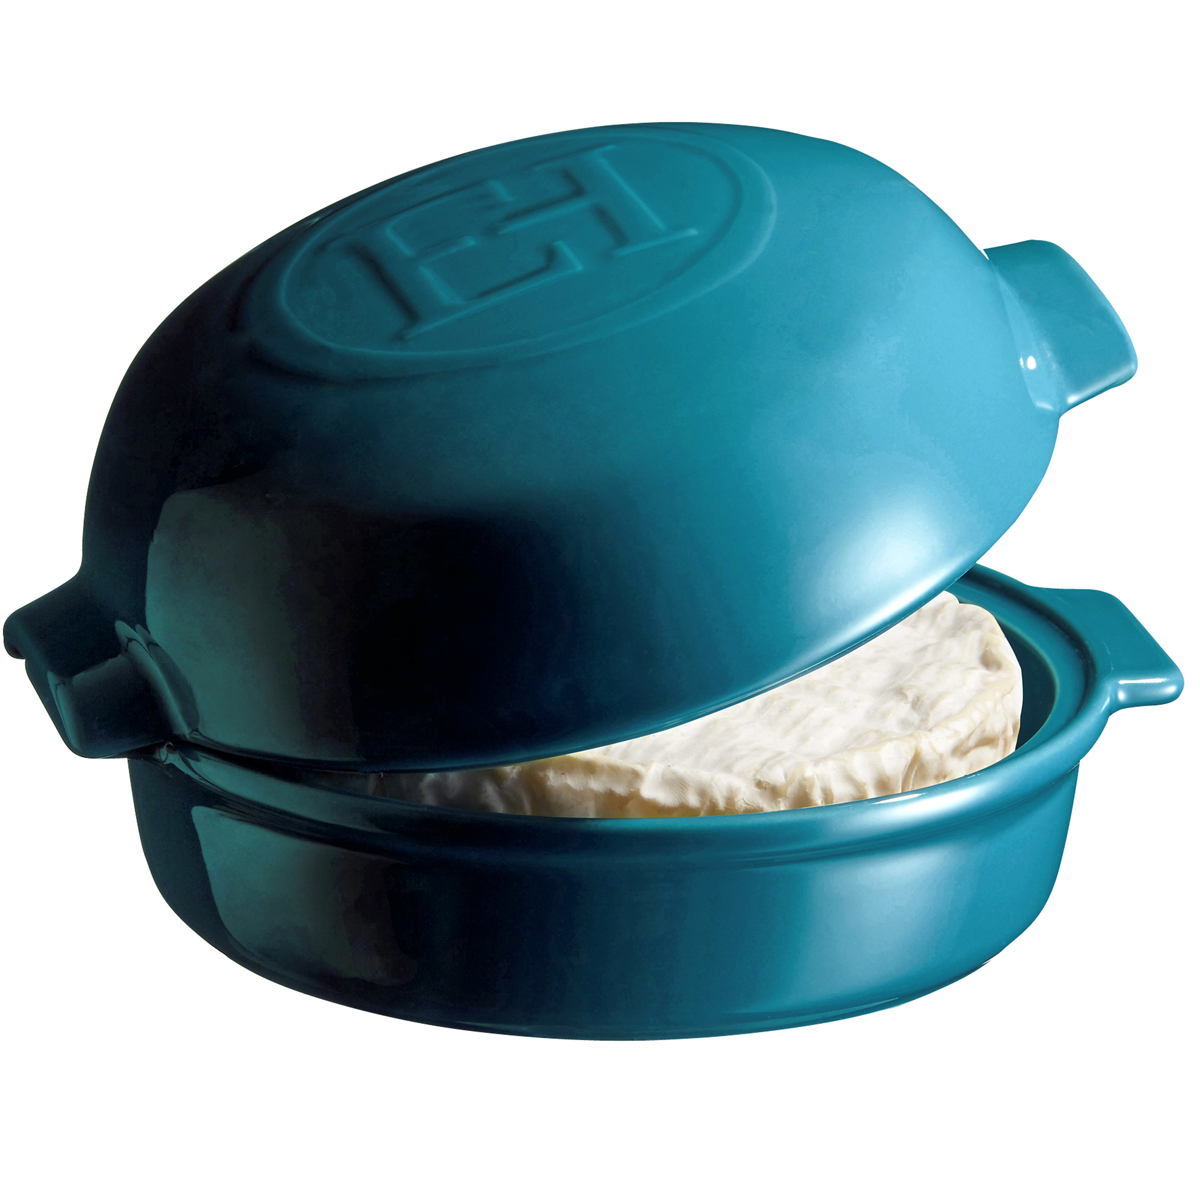 A prática tampa ajuda a manter o queijo úmido e infunde os sabores.